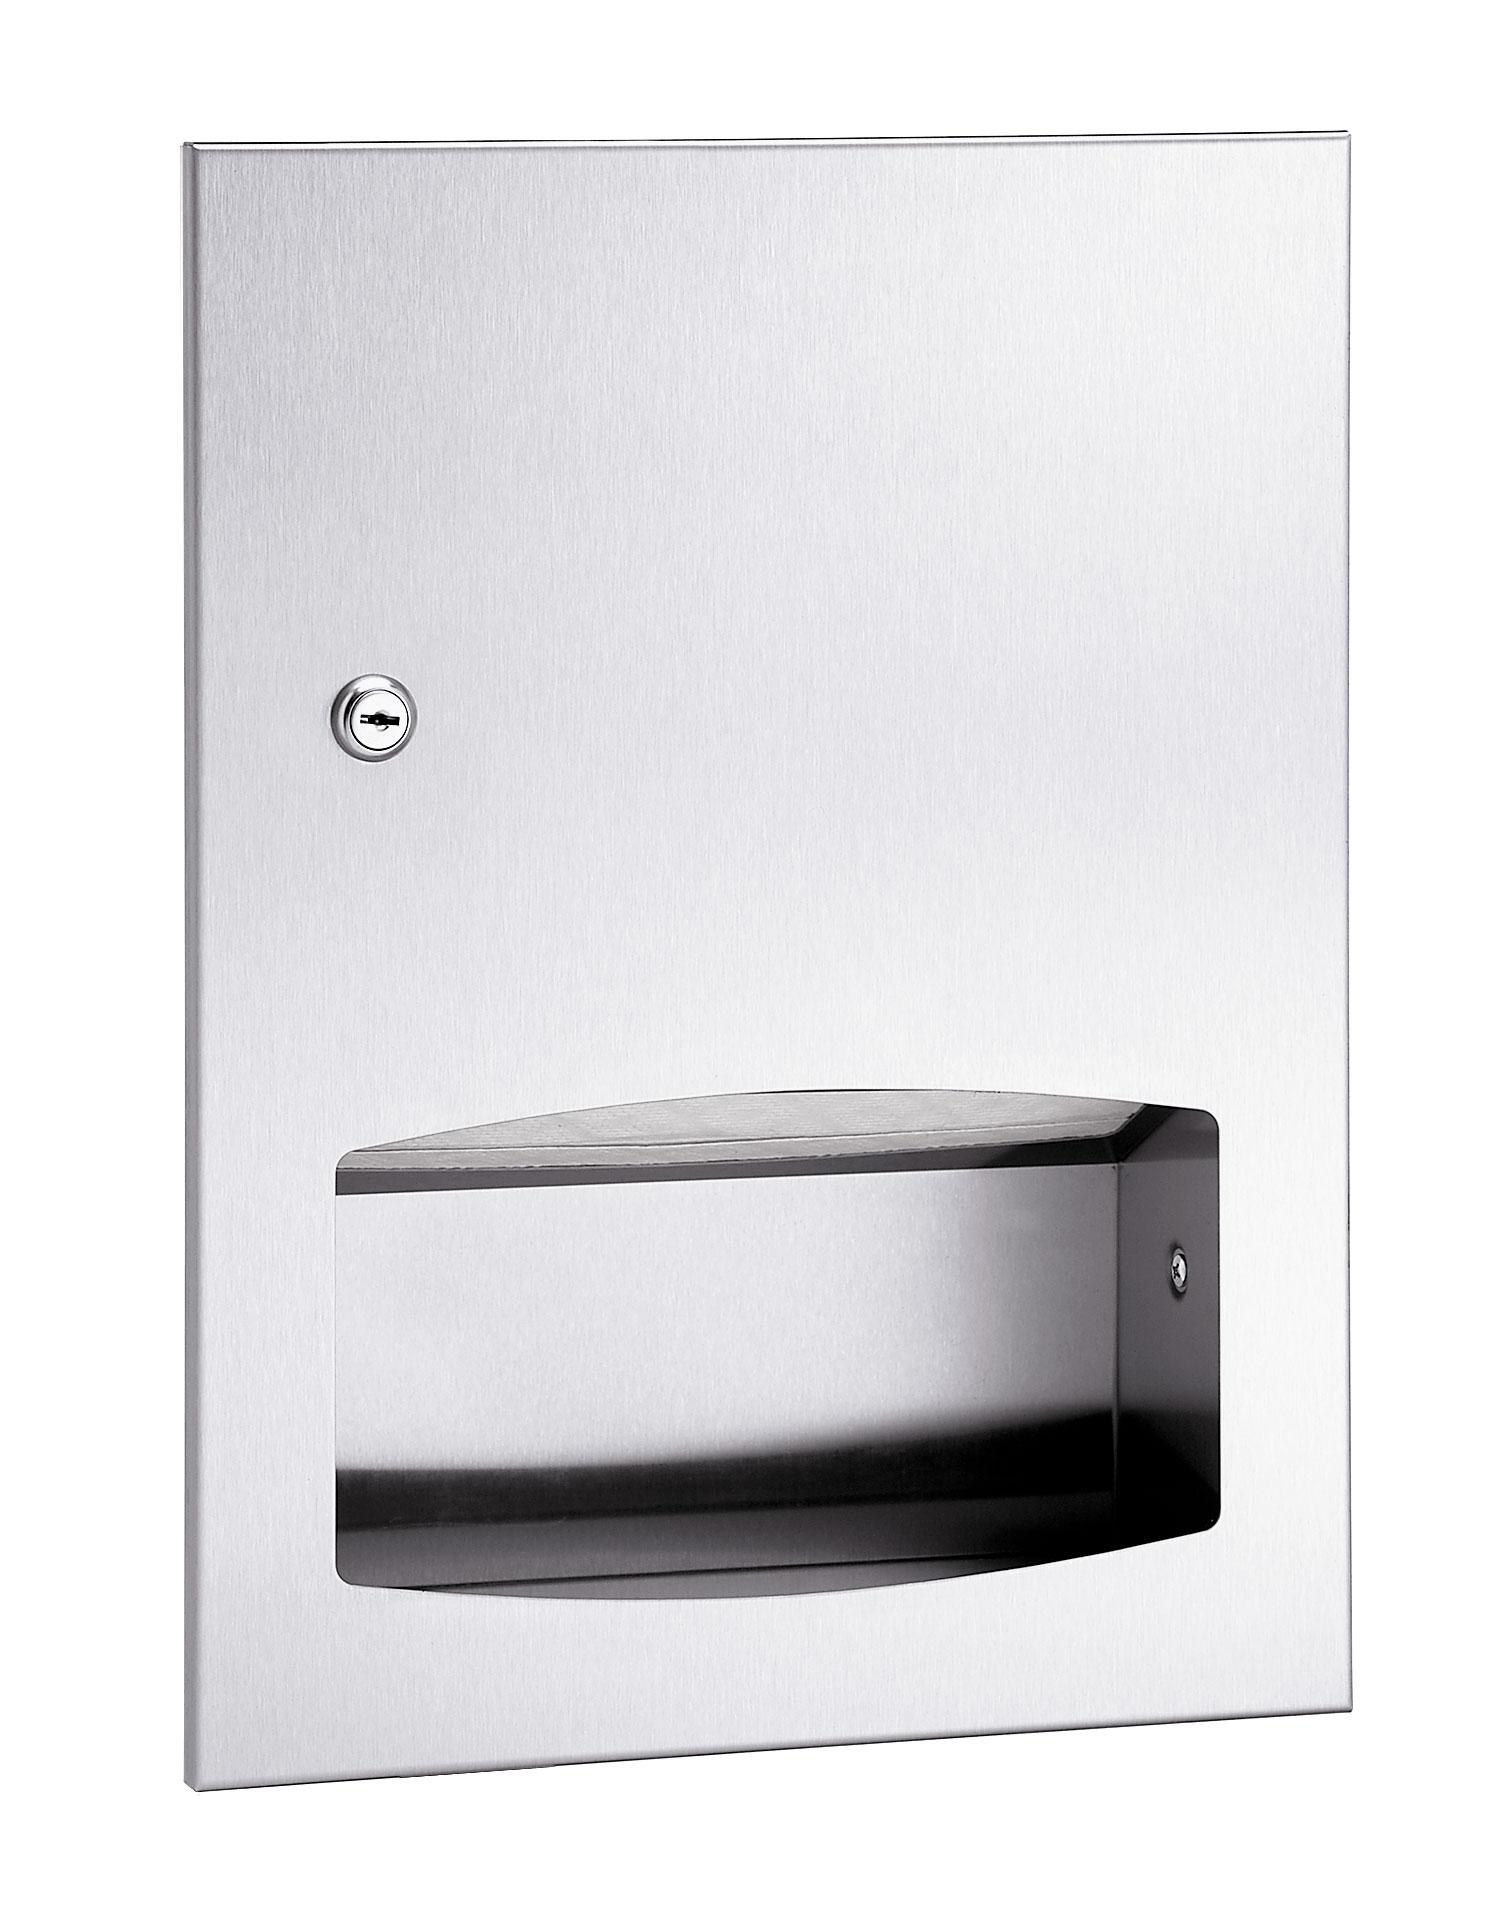 Bradley 2442 Contemporary Series Recessed Towel Dispenser